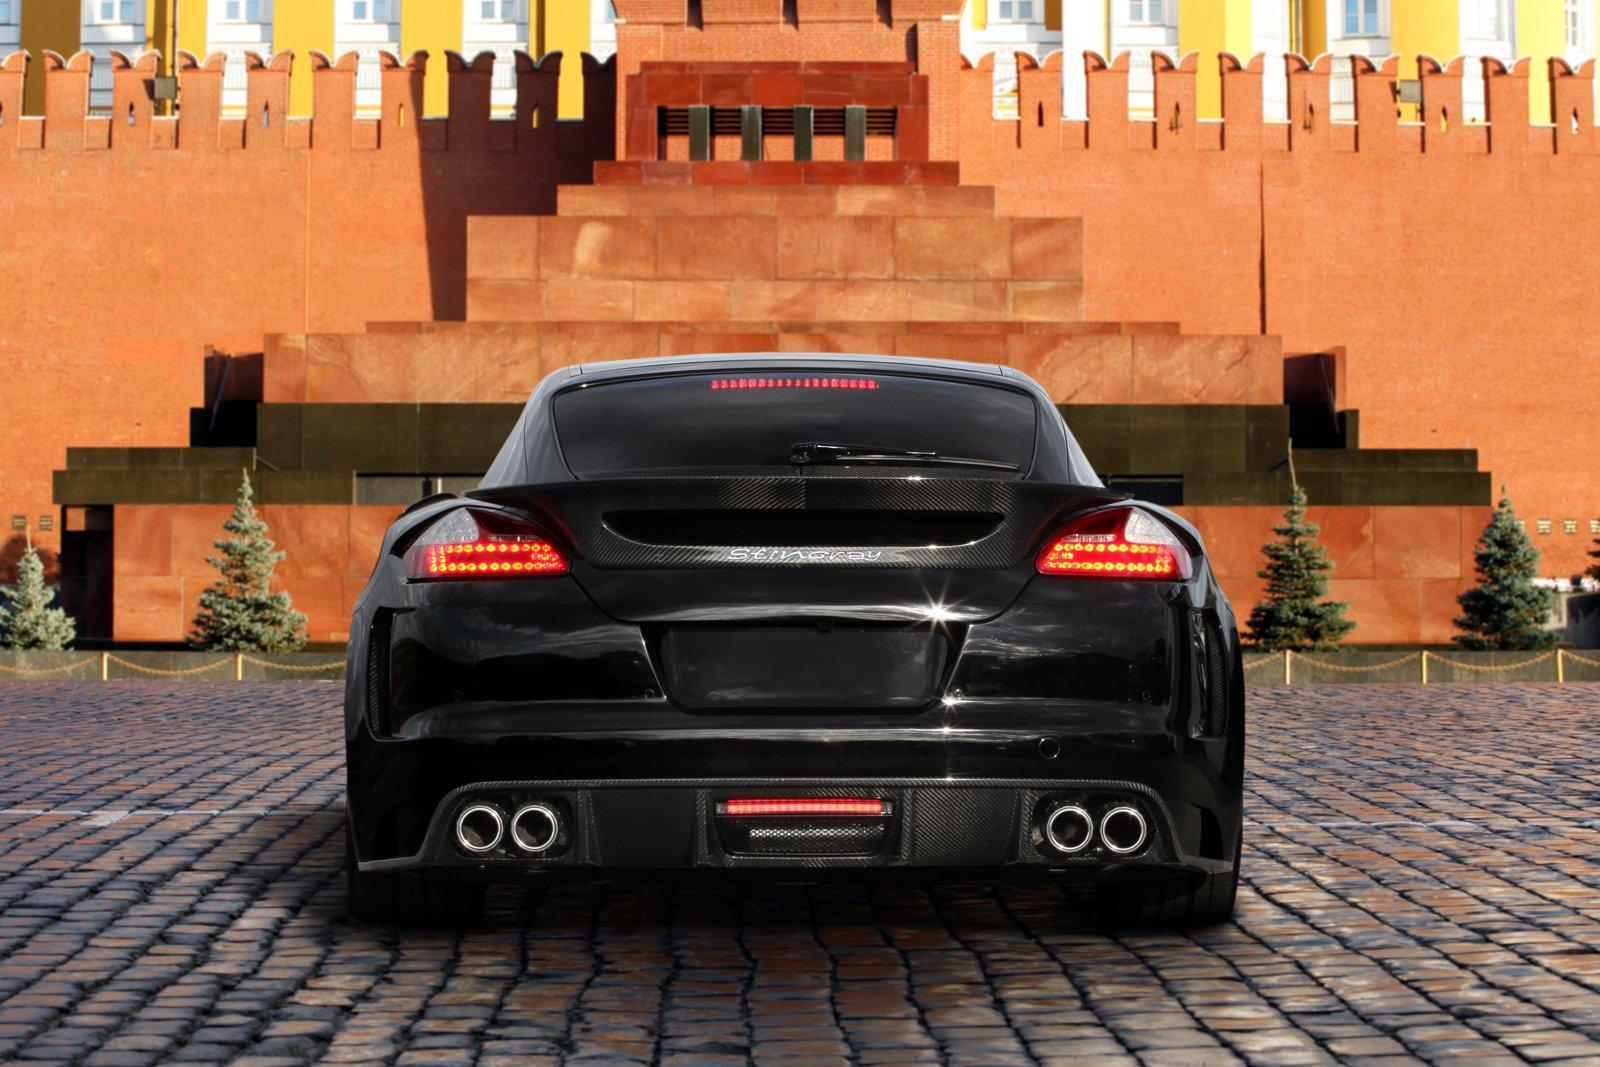 Topcar Porsche Panamera Turbo S